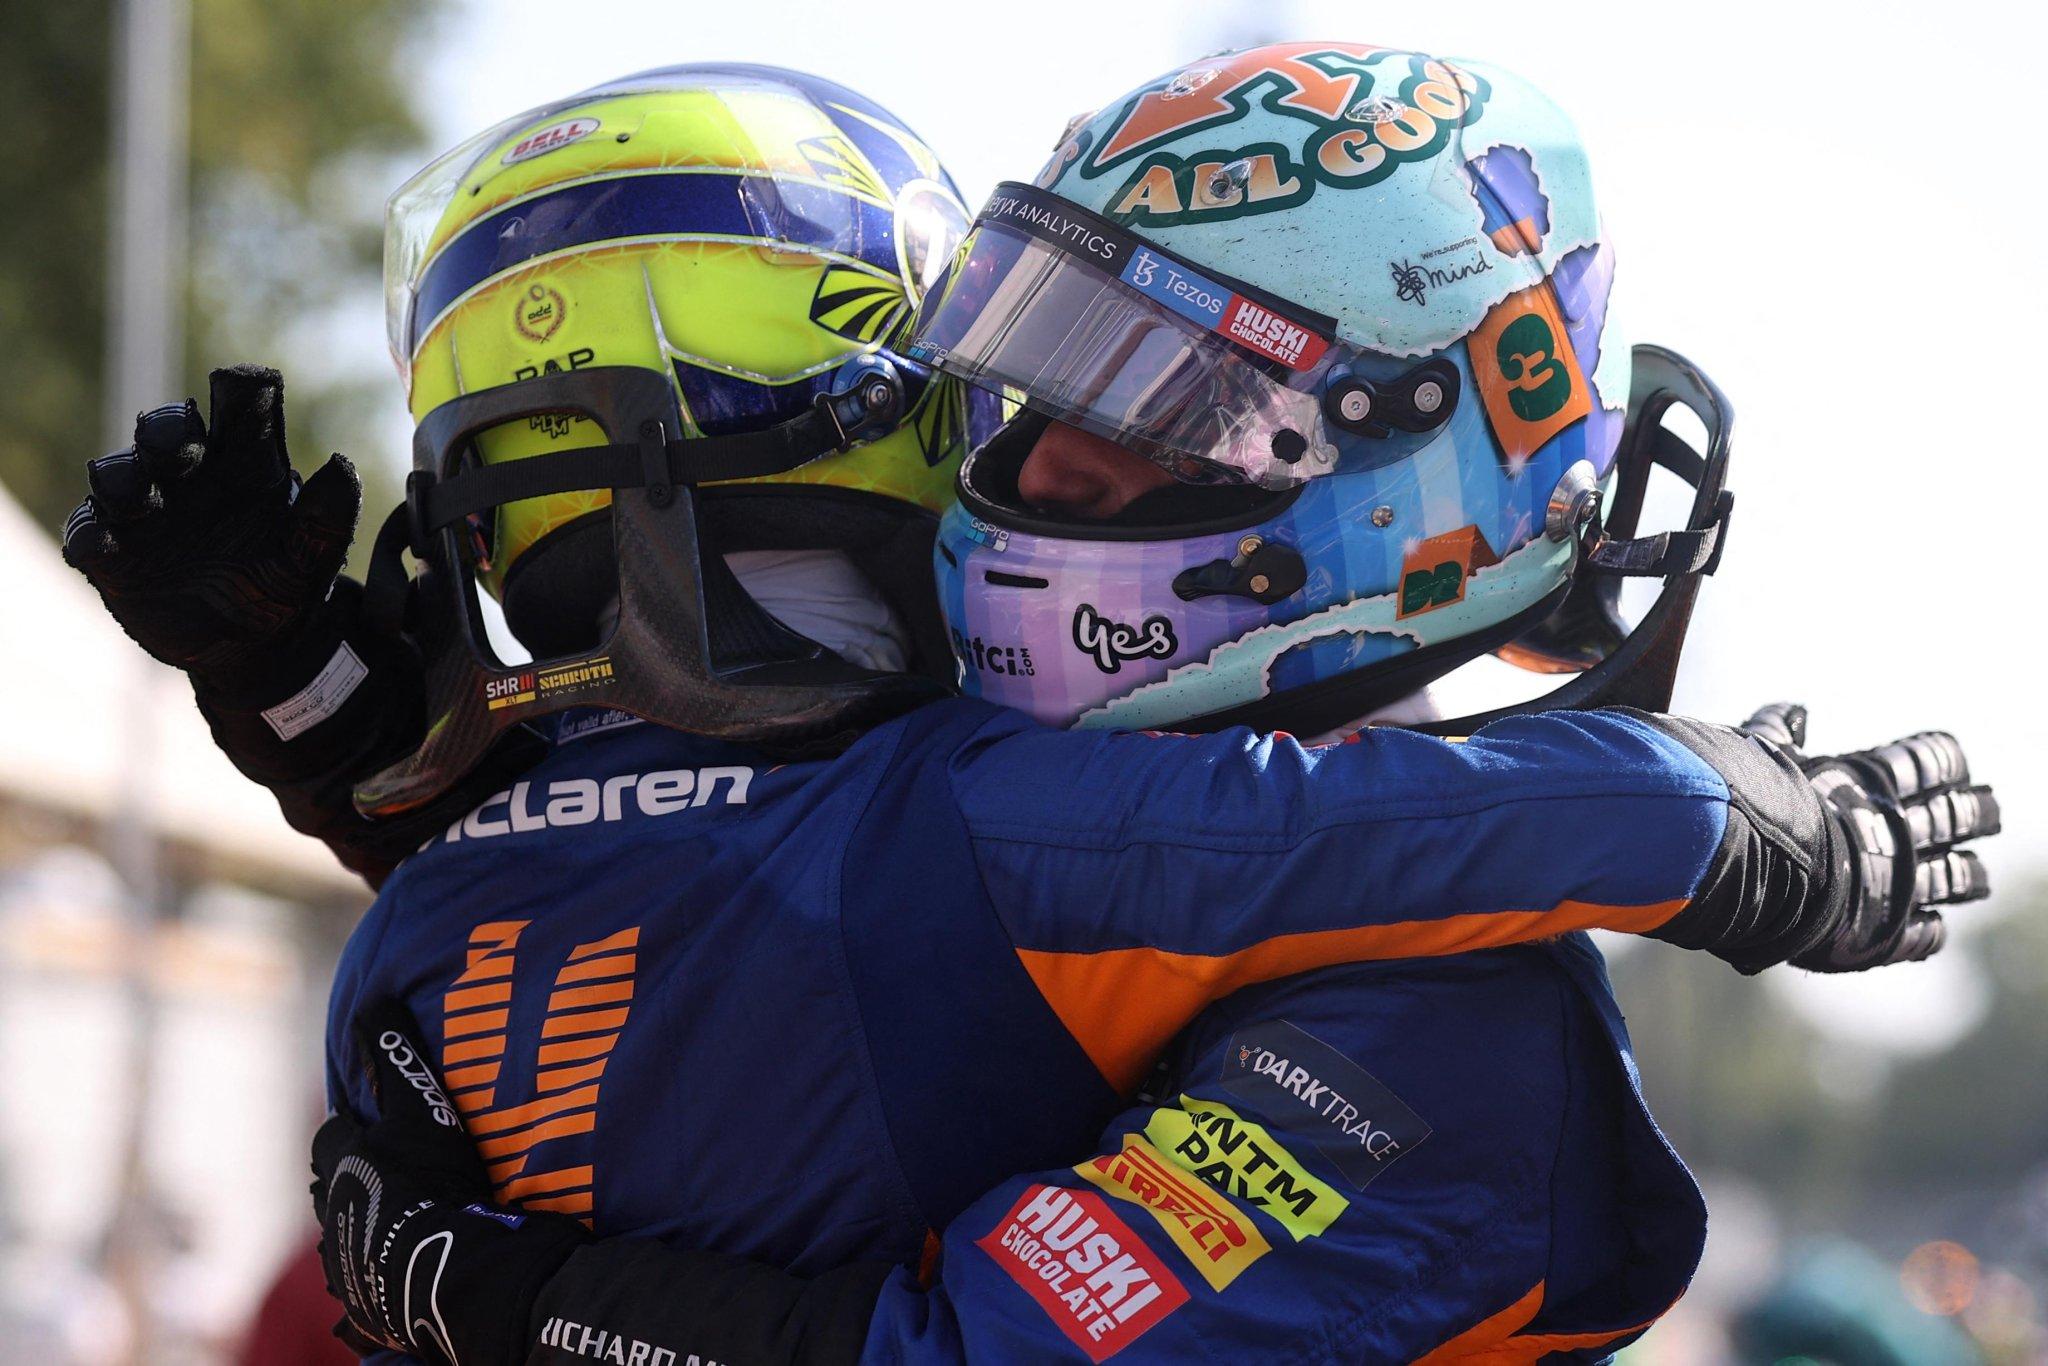 Gp Monza, Ricciardo trionfa davanti a Norris. Scontro Verstappen-Hamilton